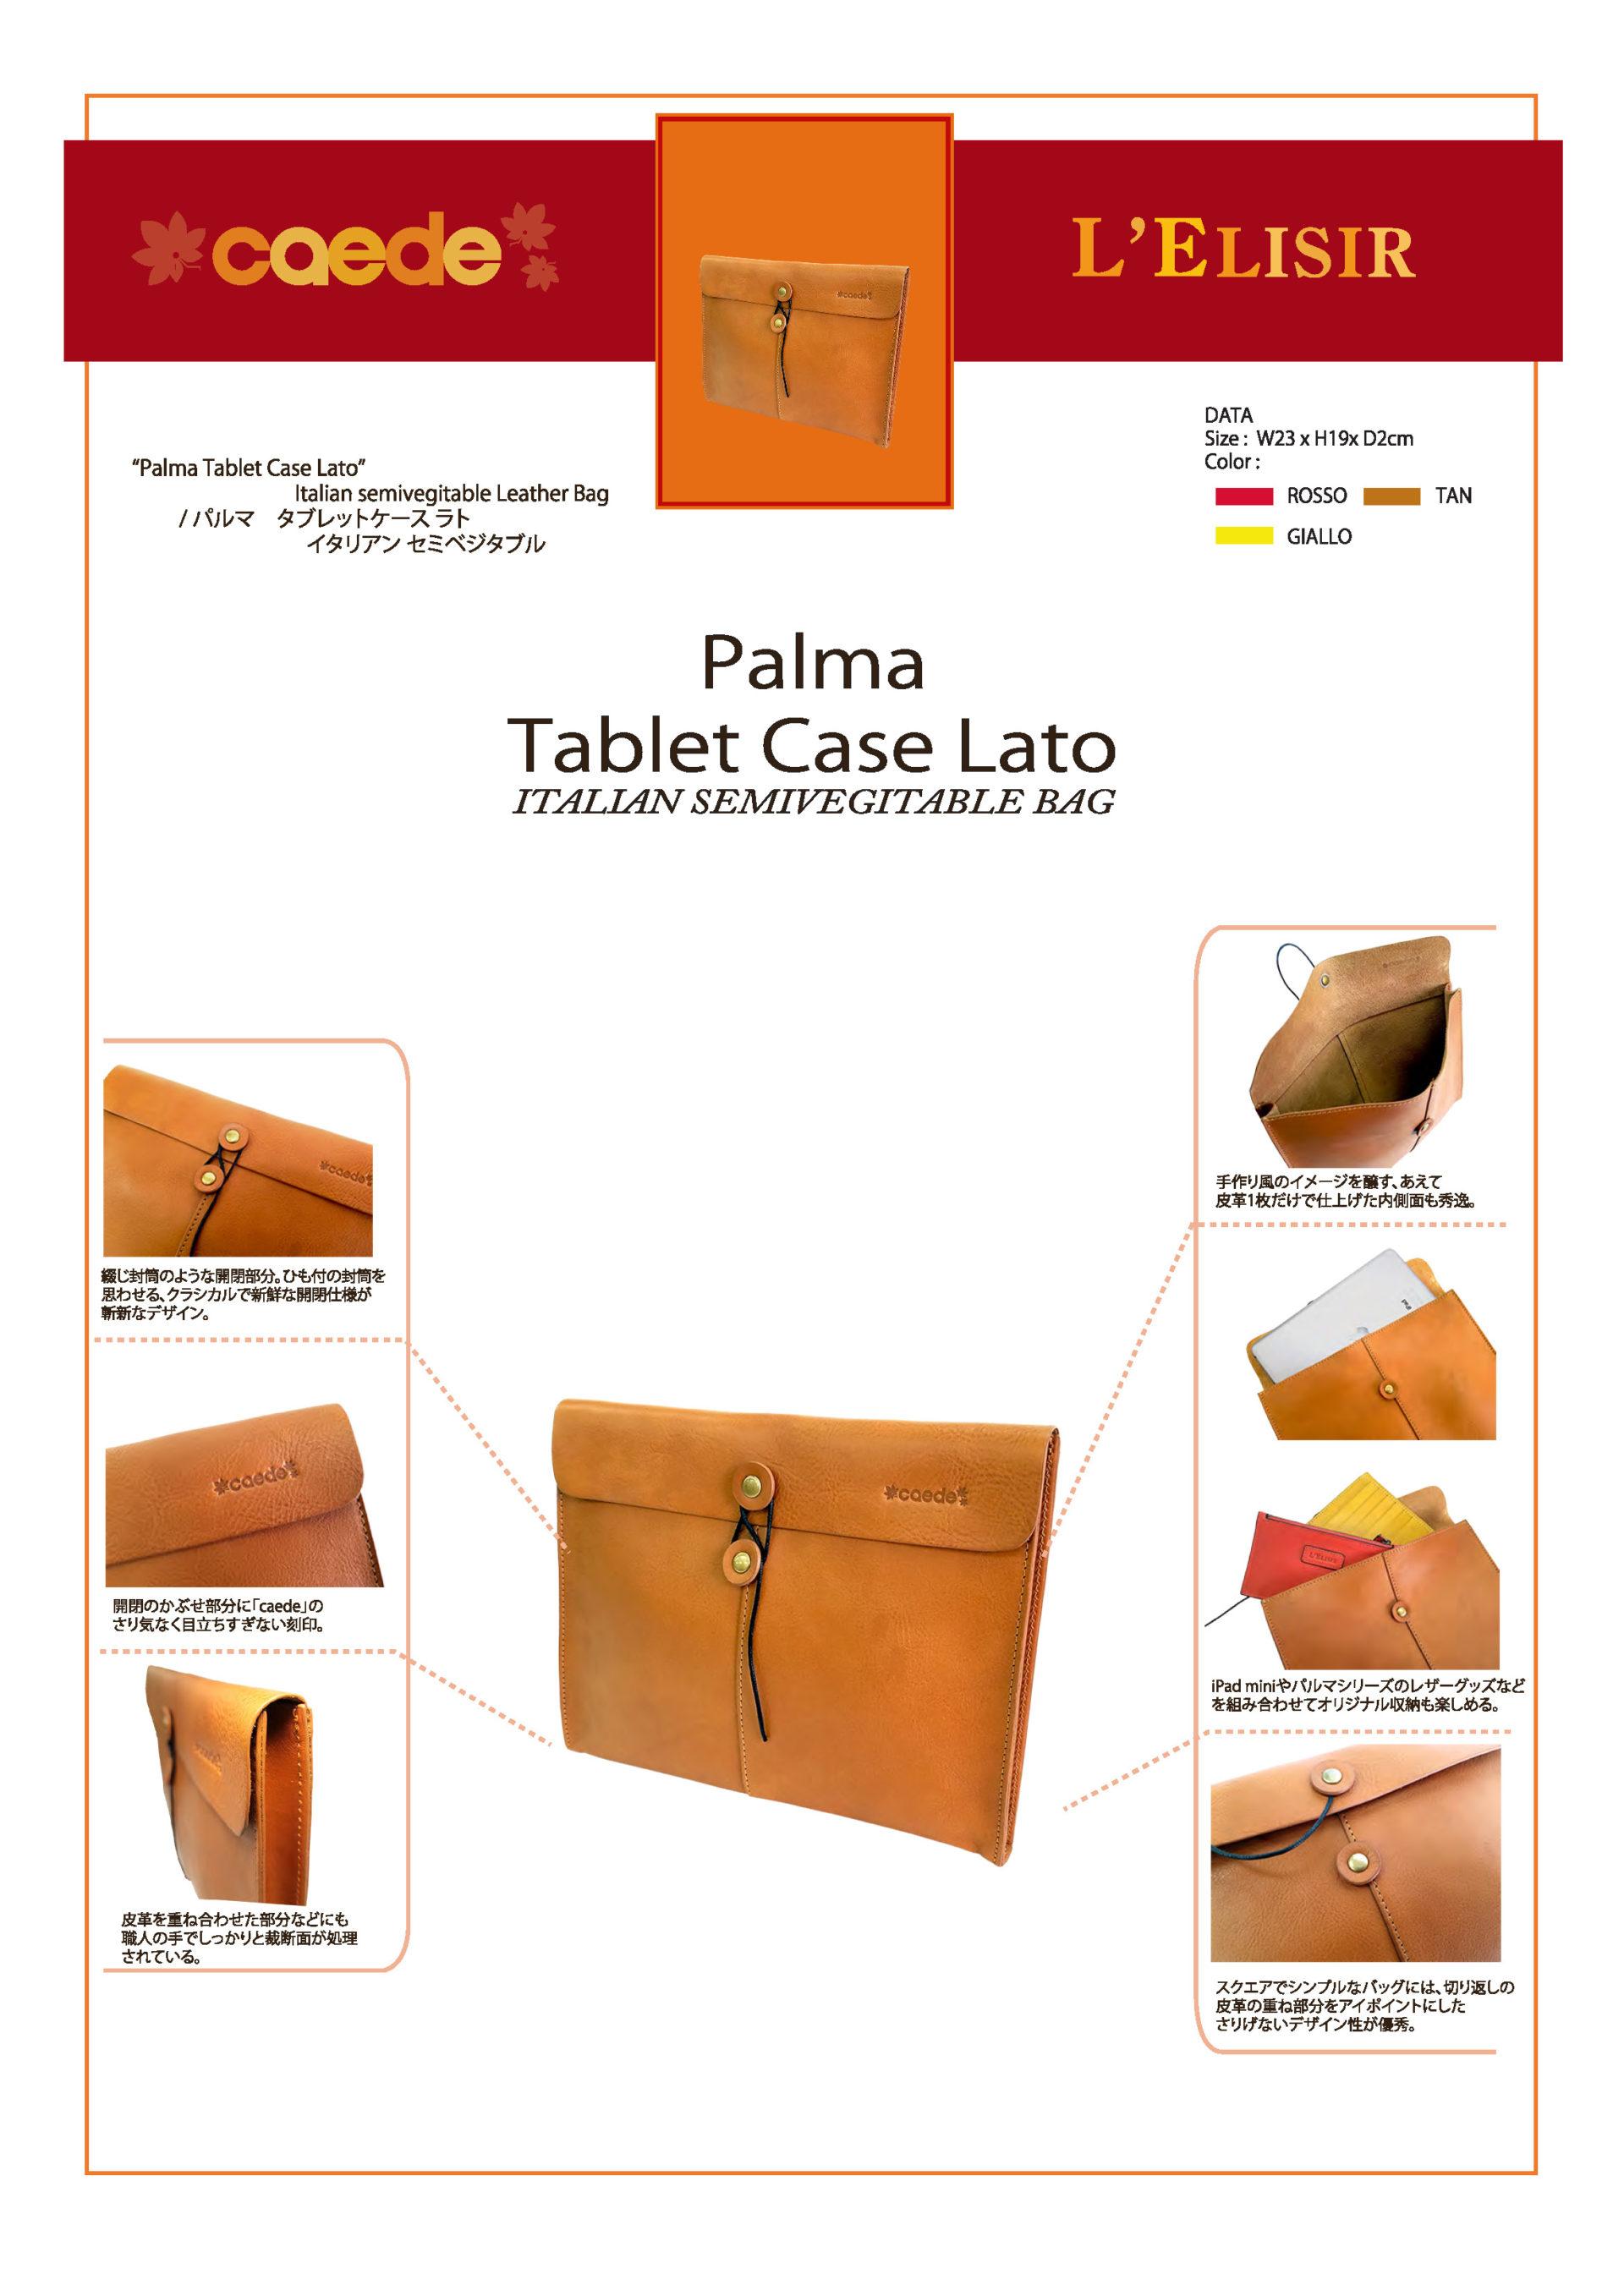 59533 palma tablet case lato